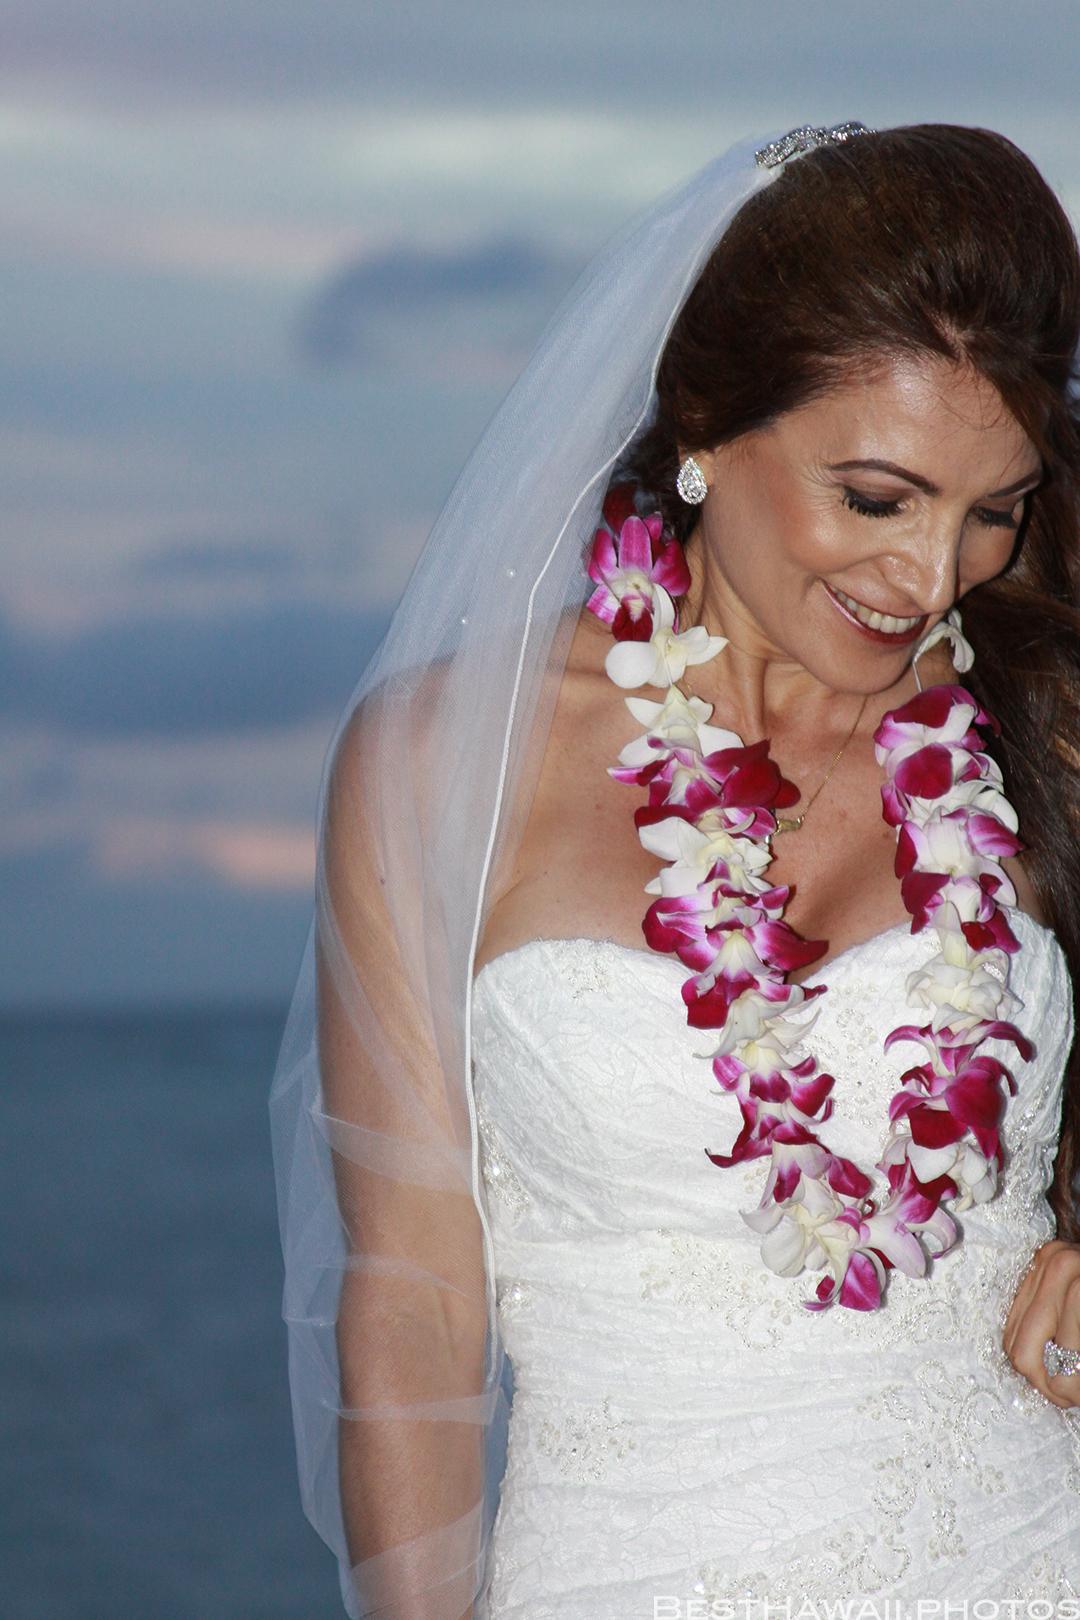 Sunset Wedding Photos in Waikiki by Pasha www.BestHawaii.photos 121820158709